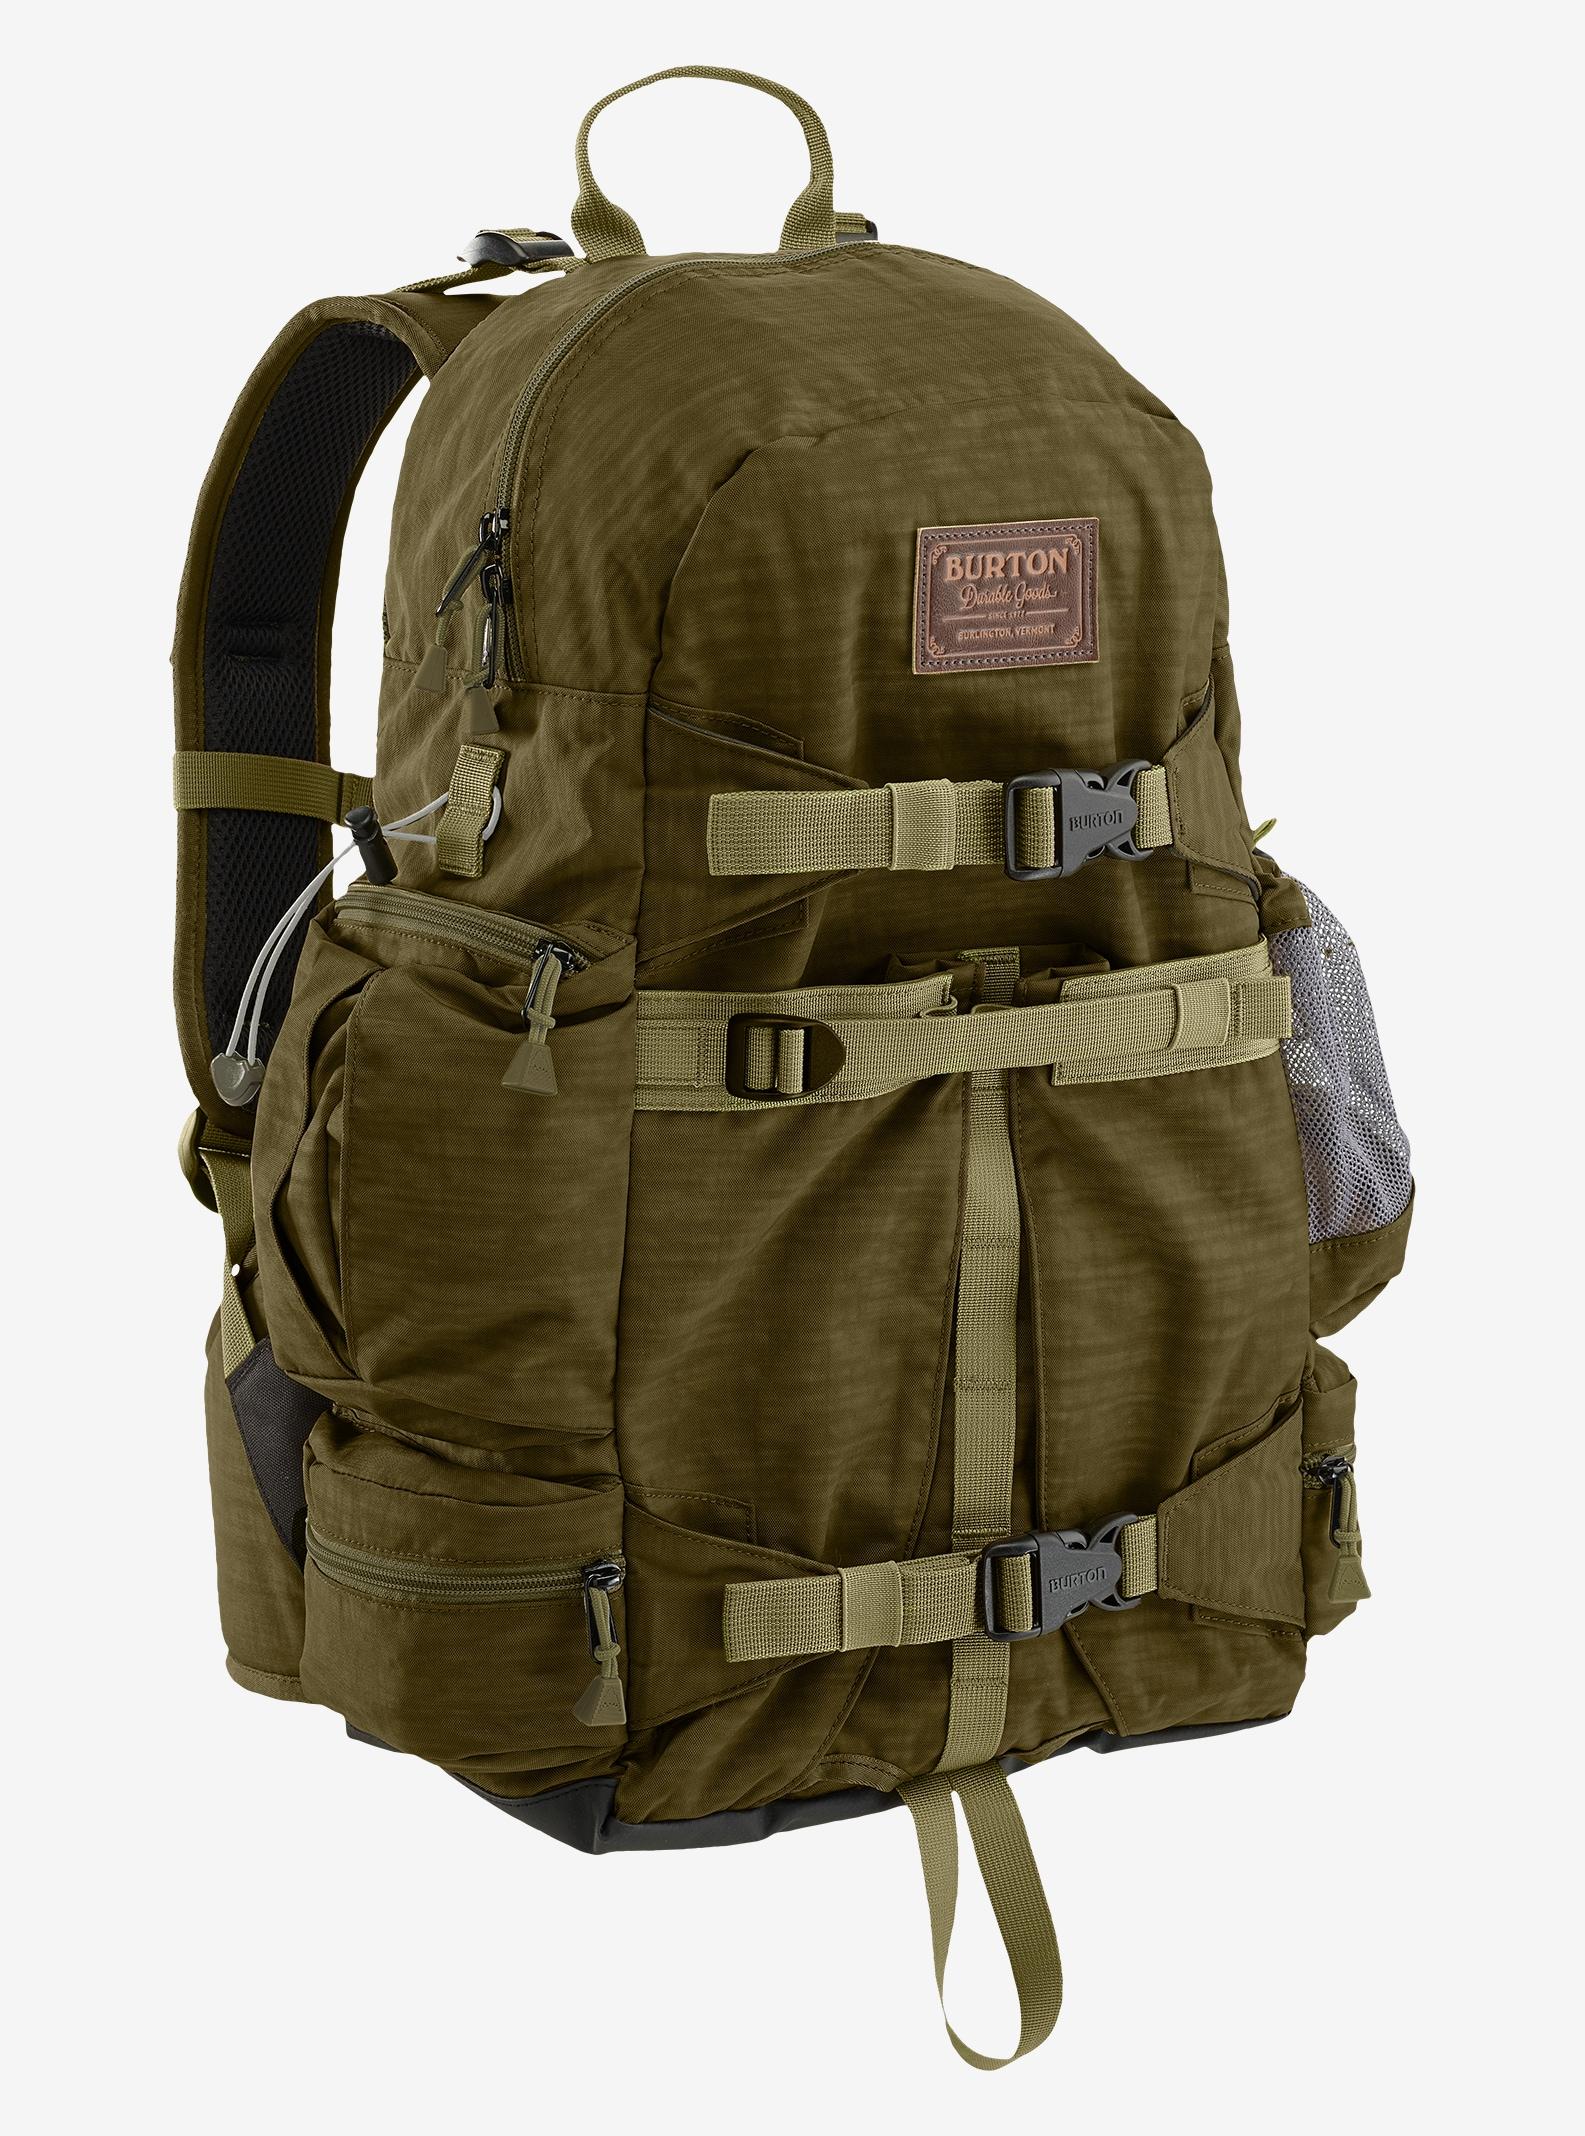 Burton Zoom 26L Backpack shown in Drab Crinkle